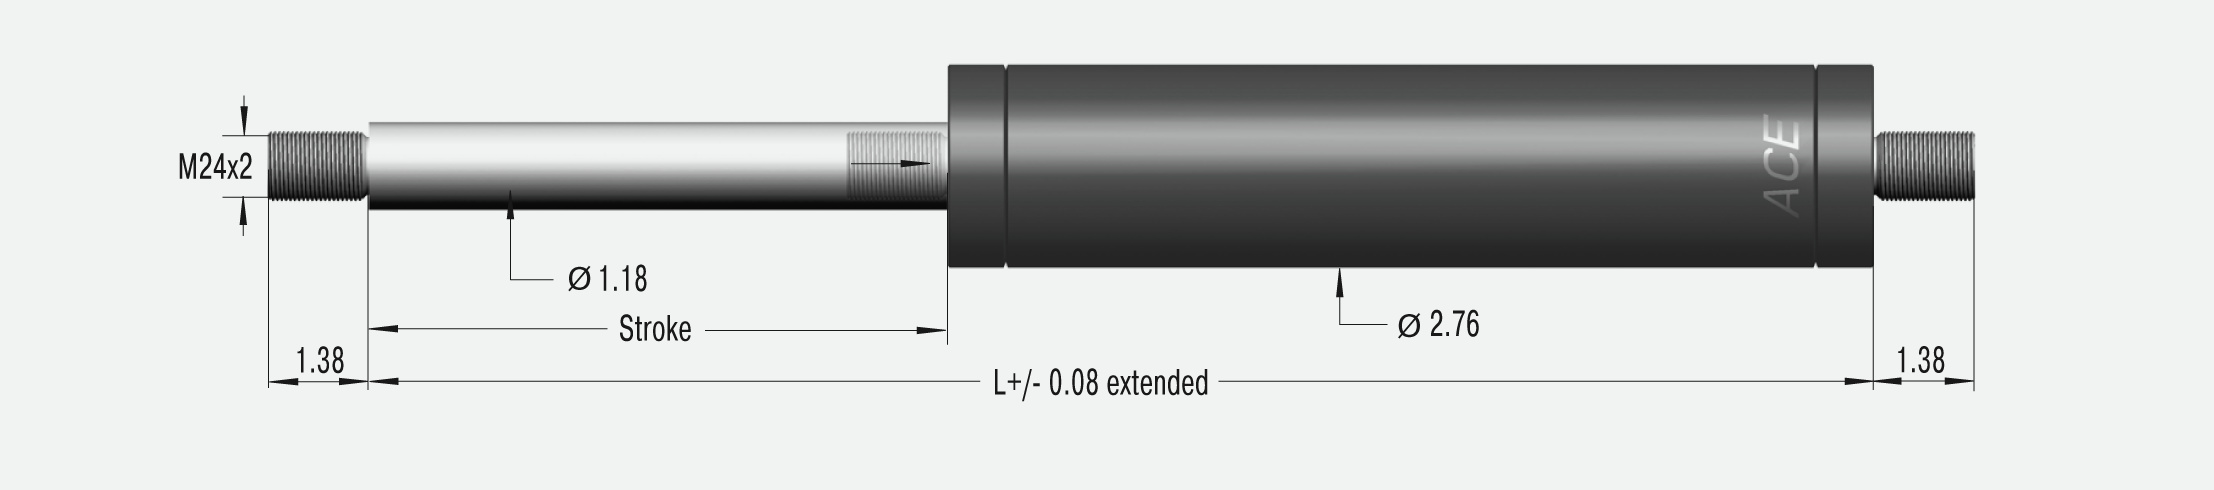 GS-70-700